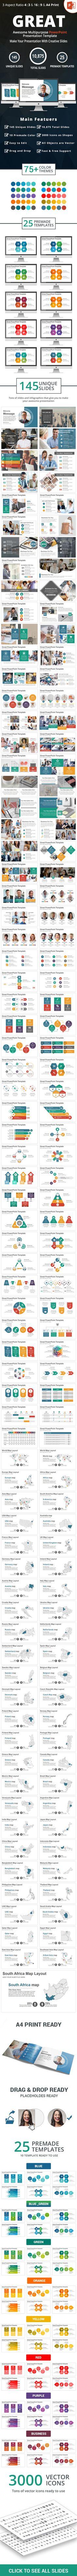 Great Multipurpose PowerPoint Presentation Template